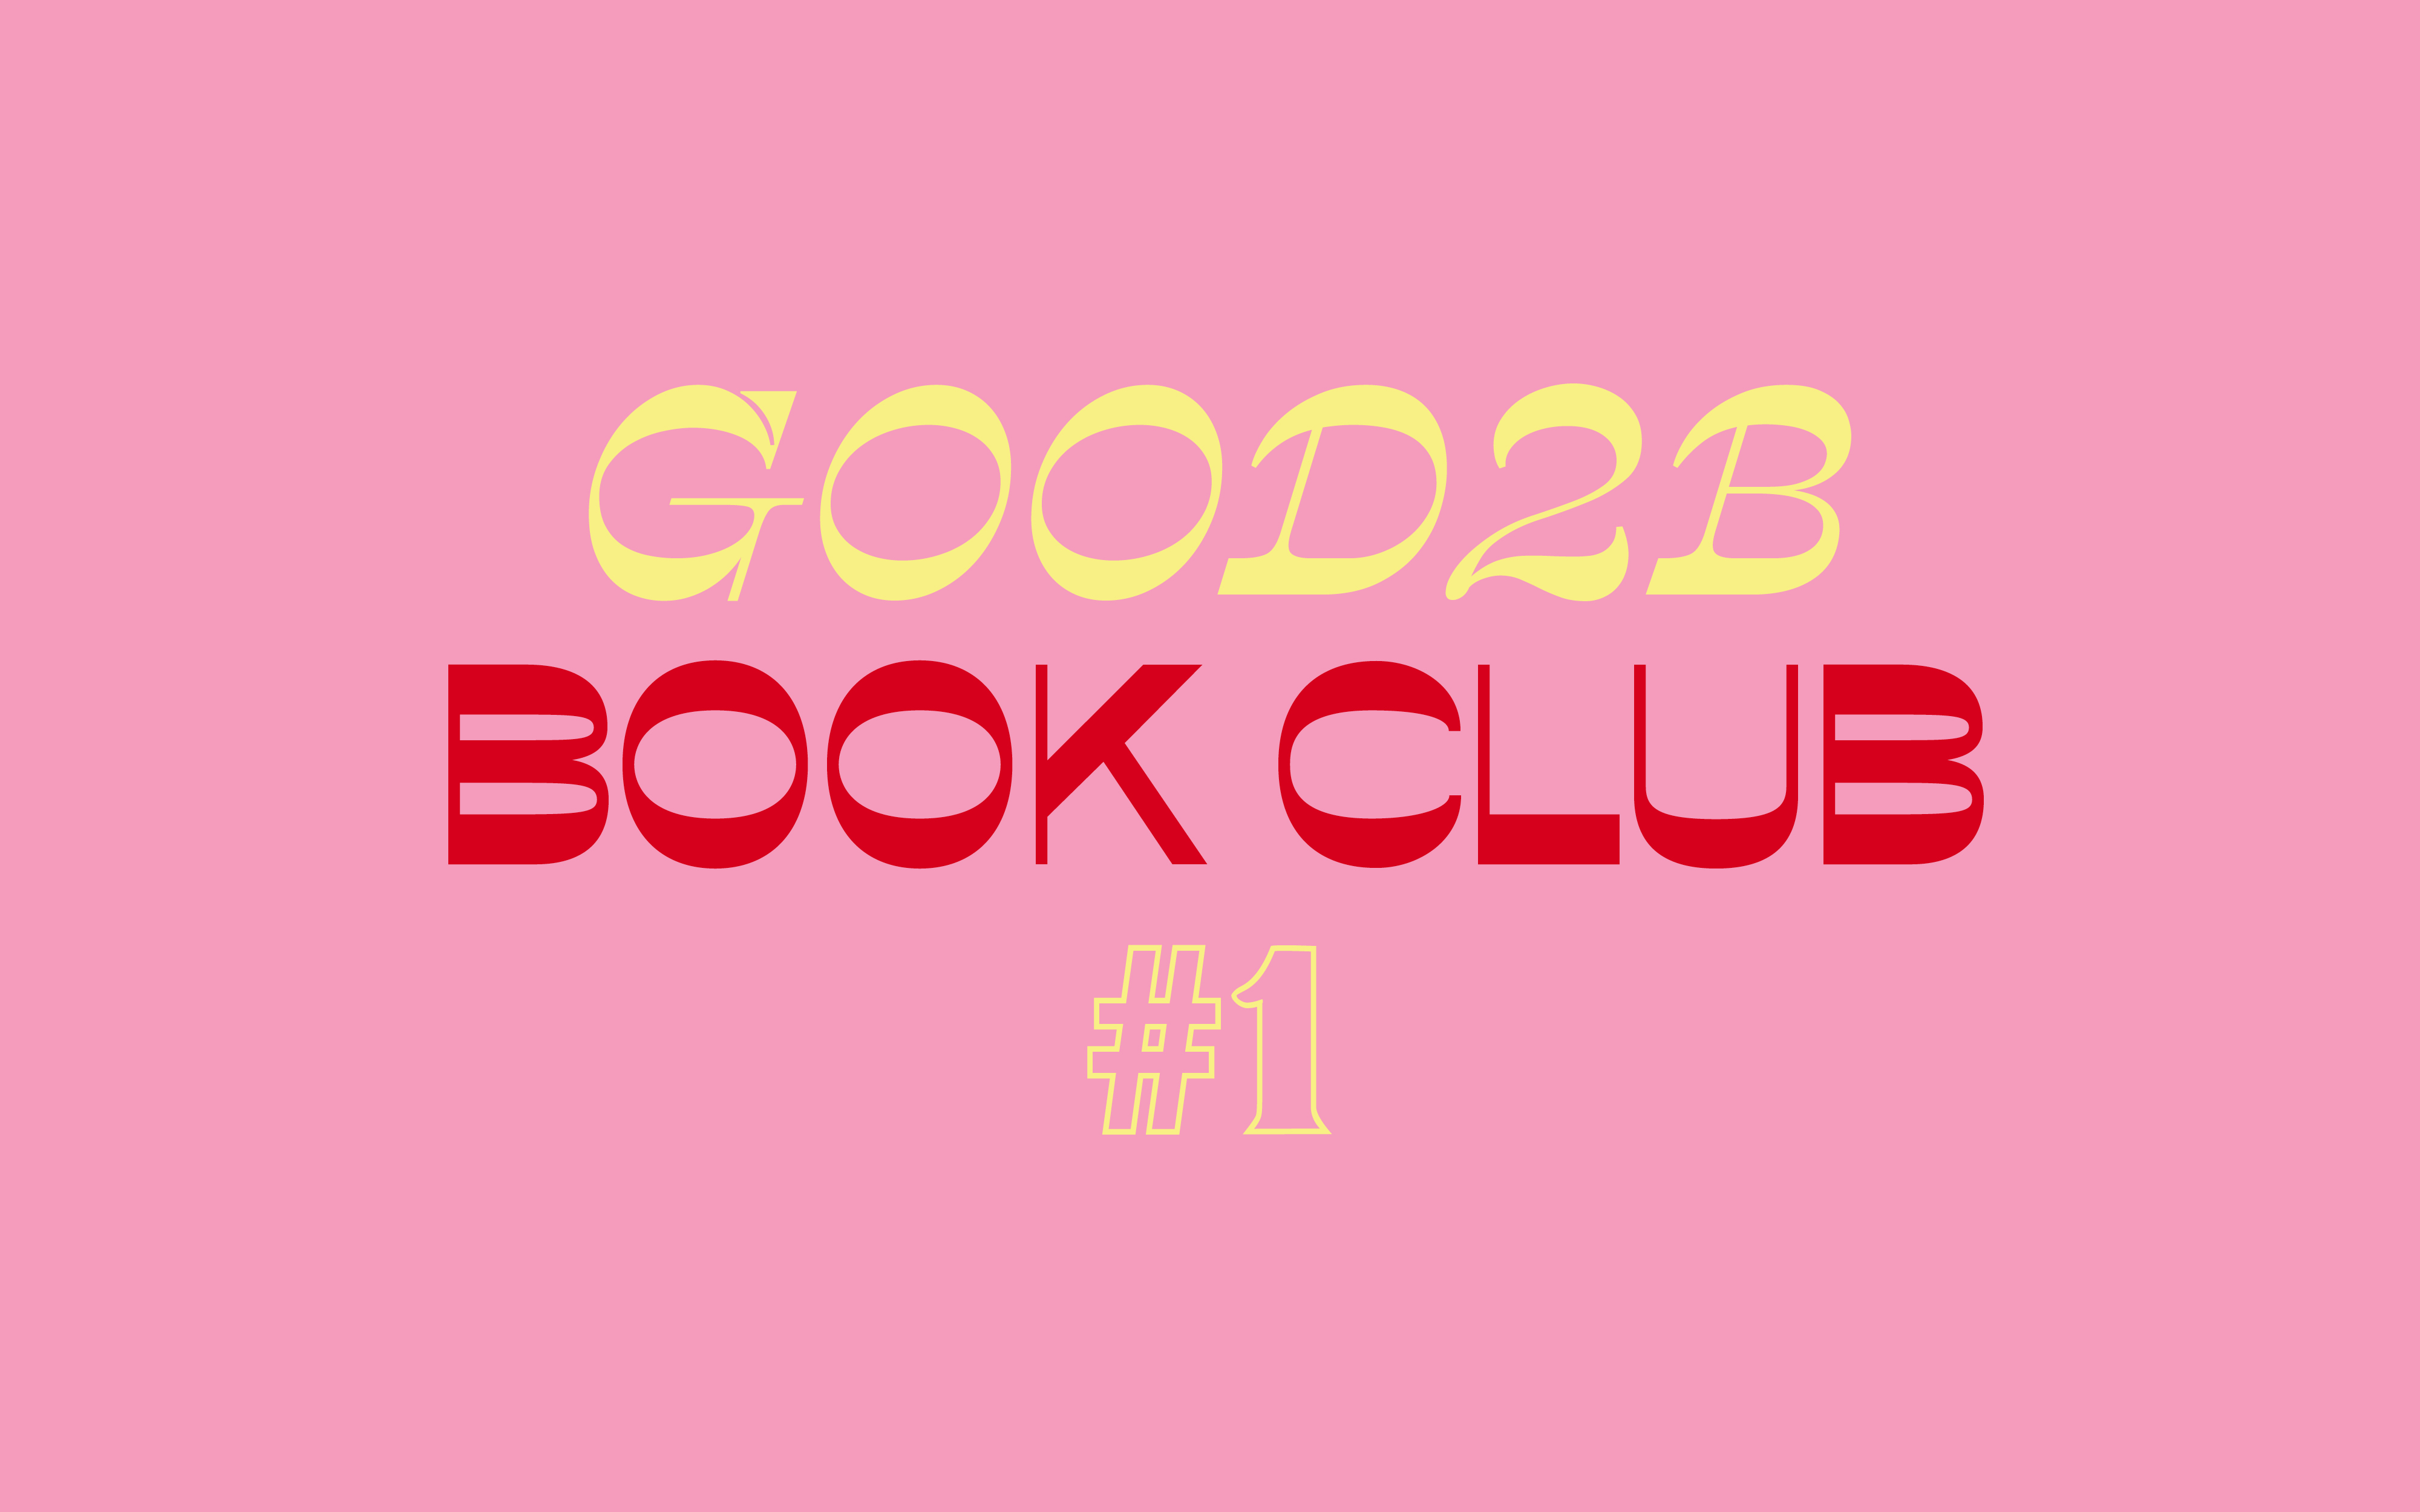 Good2b Book Club #1: Bienvenidos + 'Little Women'